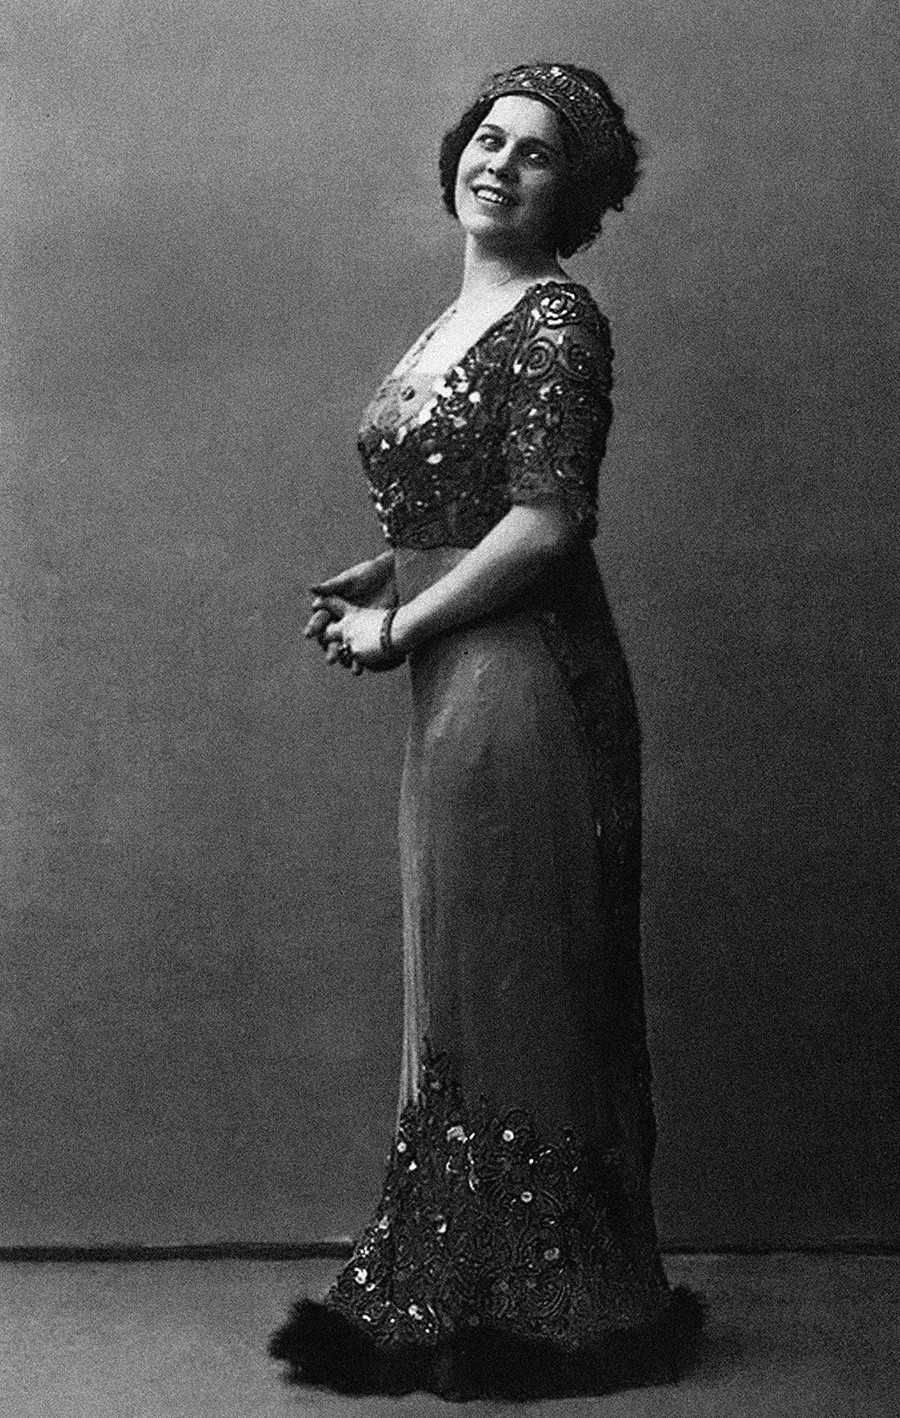 Nadeschda Plewitskaja (1884-1940).